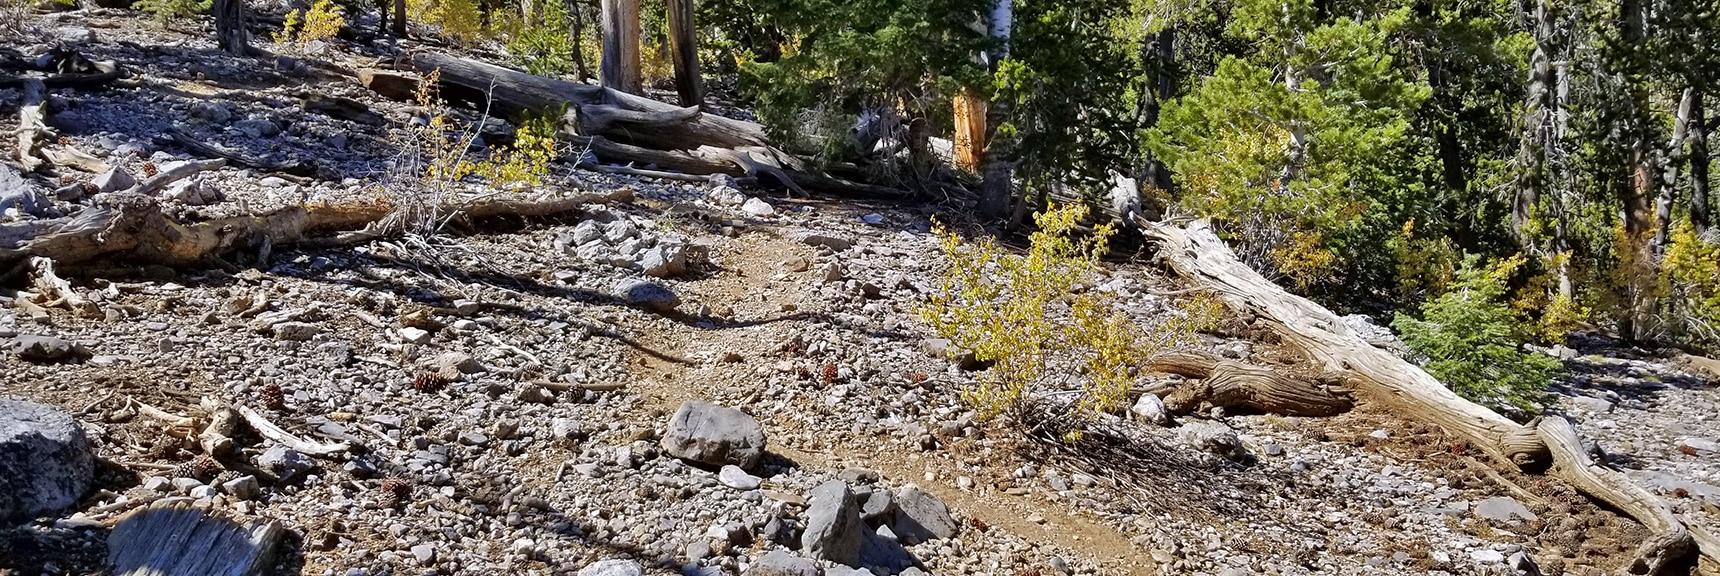 Upper Cougar Ridge Trail in Excellent Condition | Mummy Springs Loop | Mt. Charleston Wilderness | Spring Mountains, Nevada